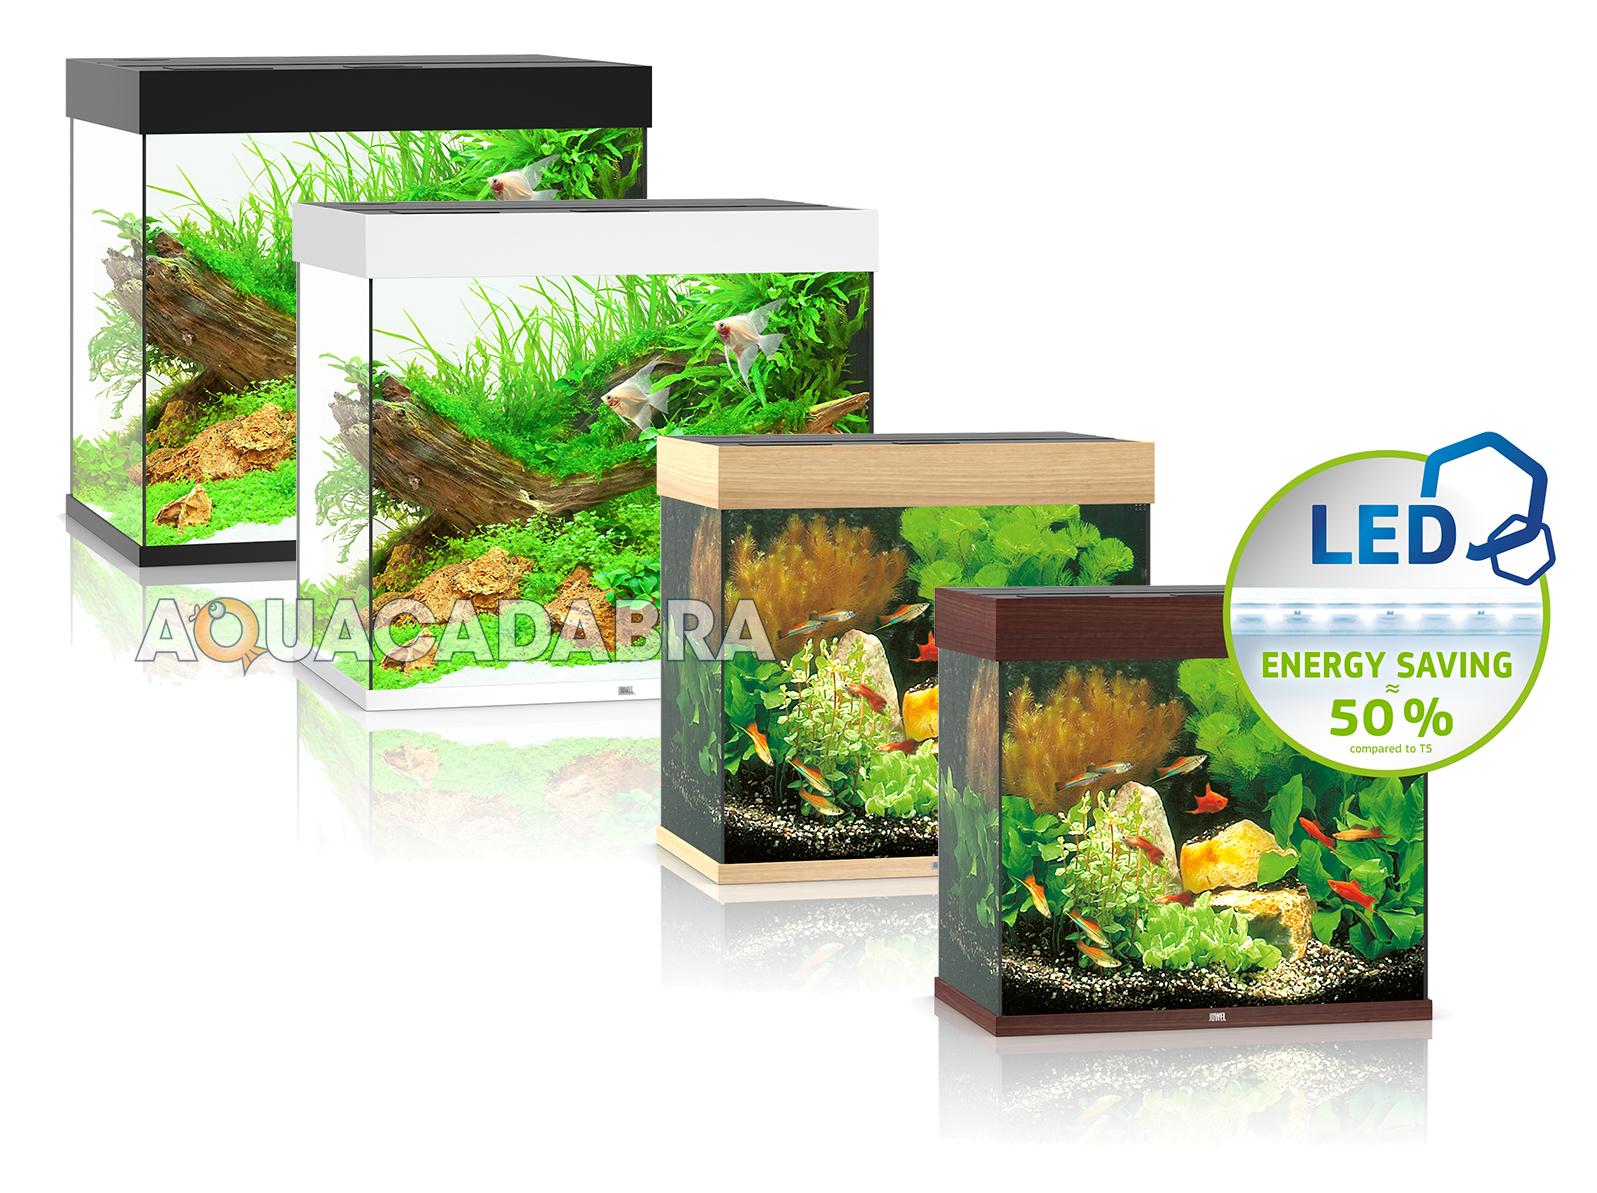 Juwel-LED-Aquariums-Rio-Lido-Trigon-Vision-Fish-Tanks-Only-filter-amp-pump